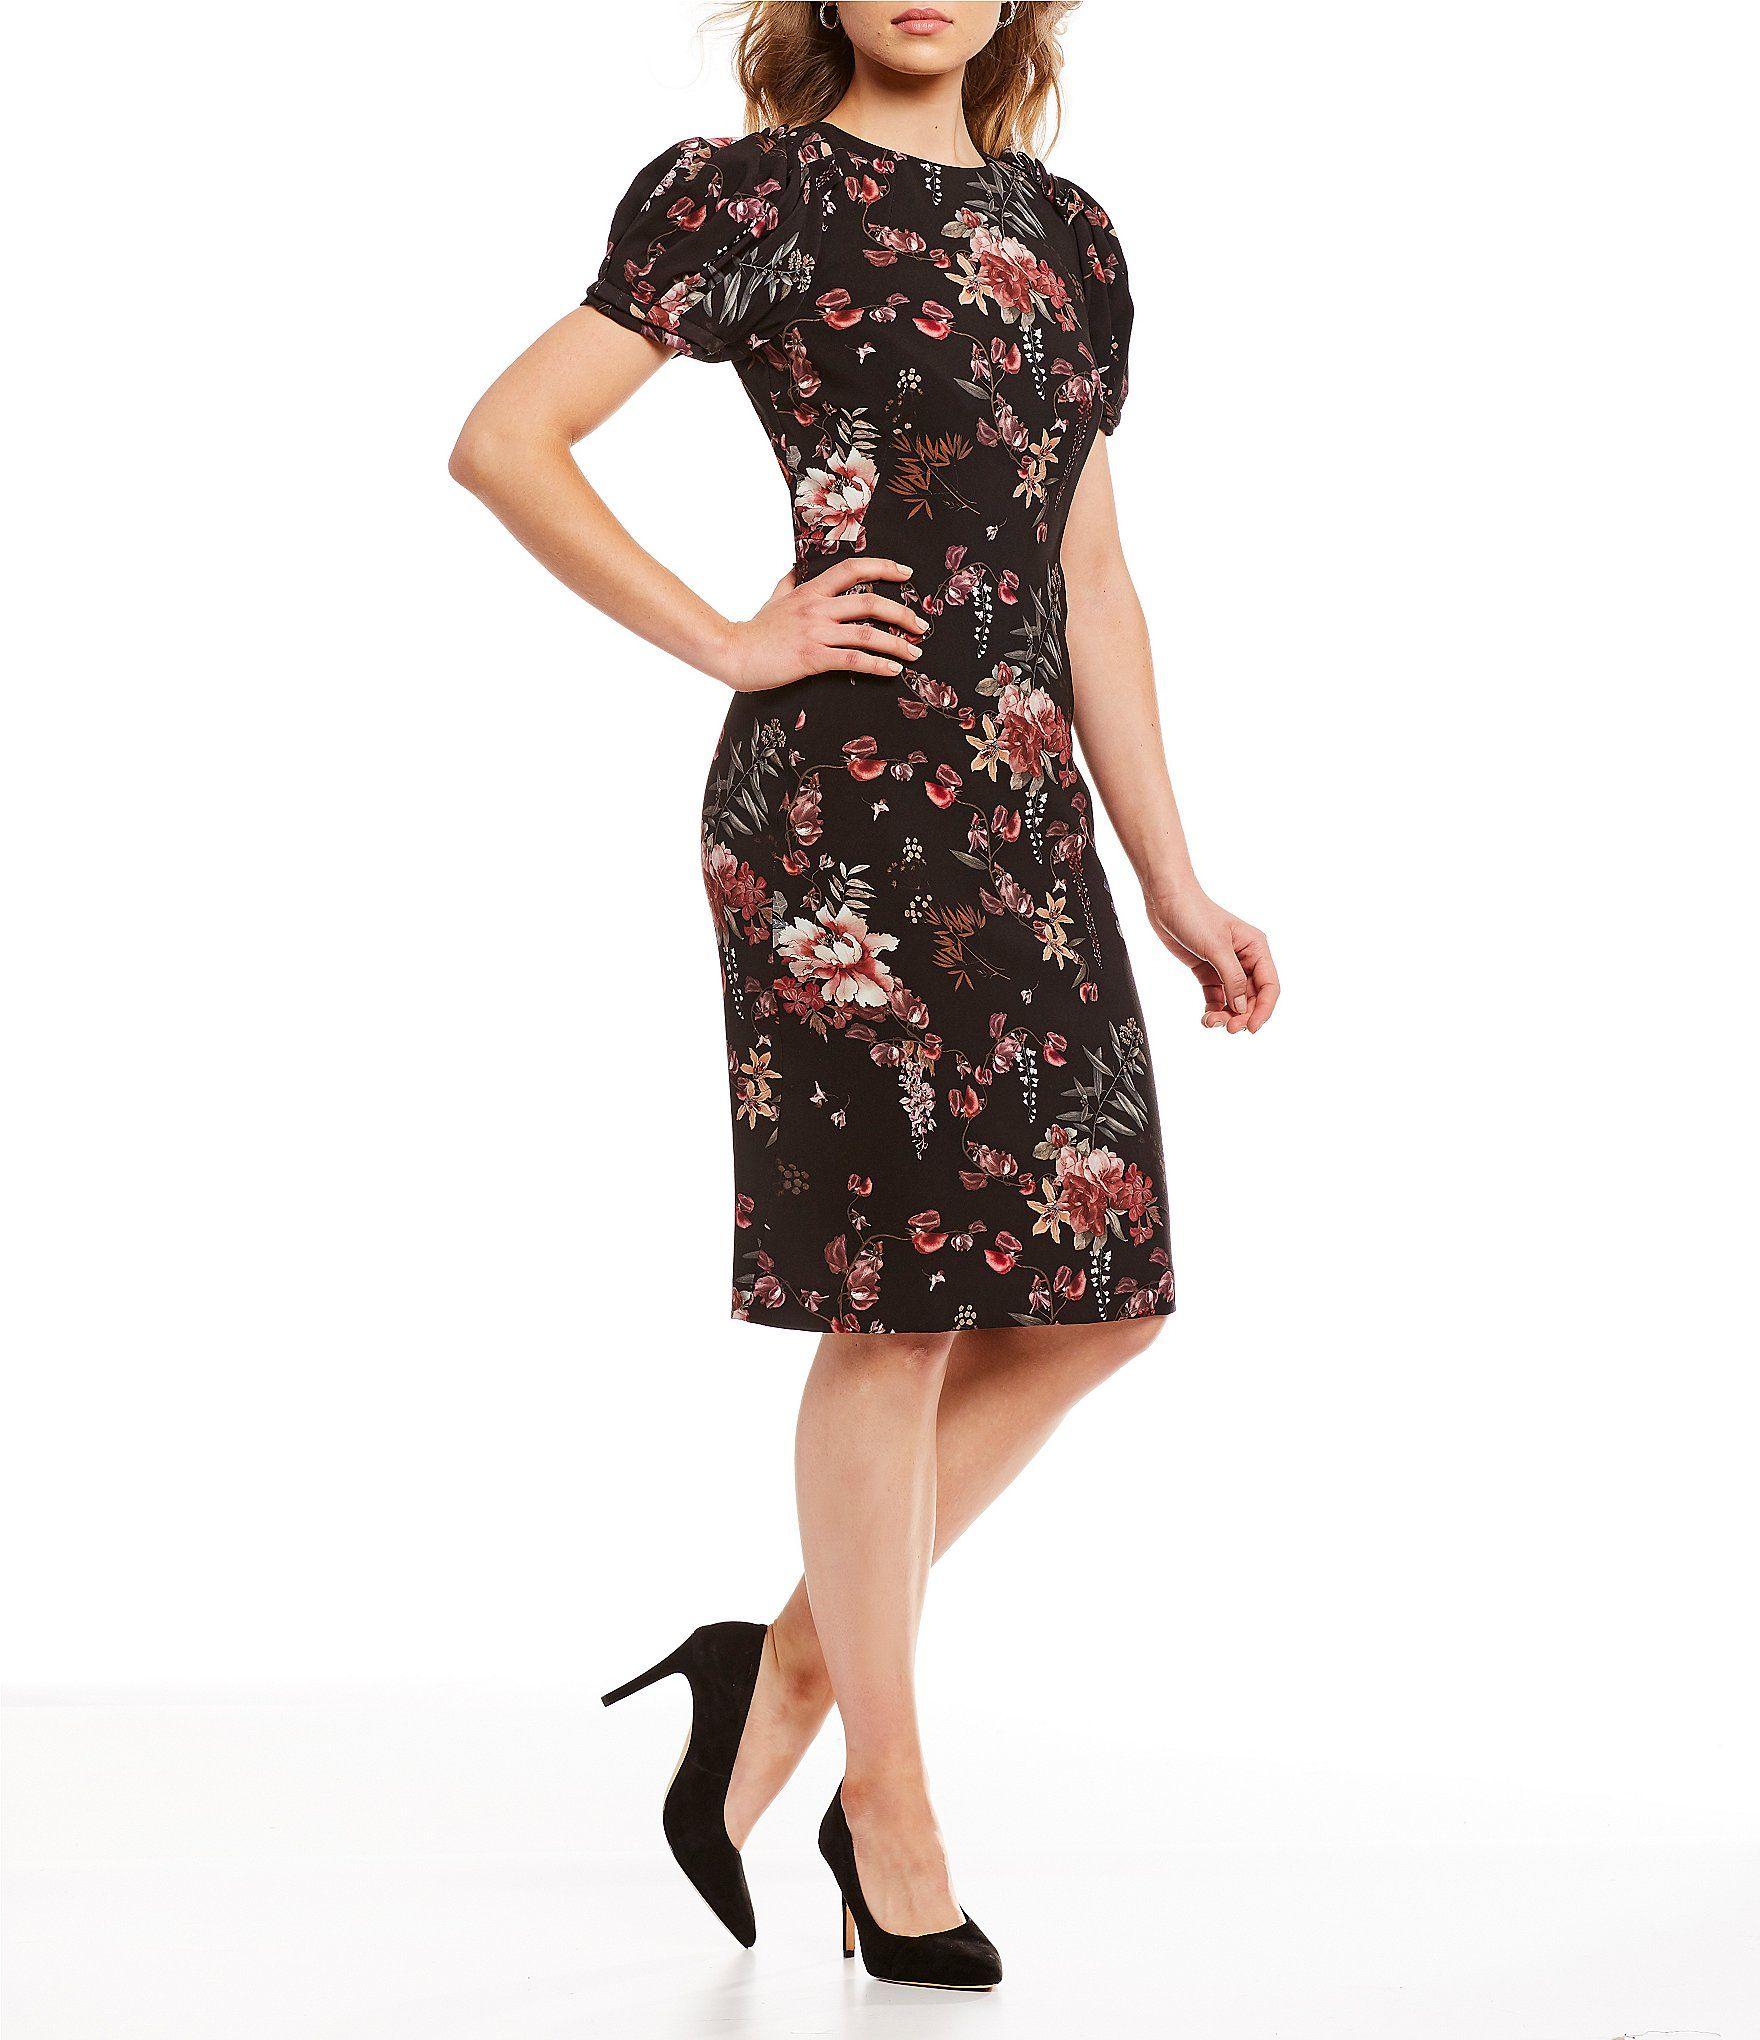 9478d26d3df Shop for Antonio Melani Tatum Floral Print Short Puff Sleeve Sheath Dress  at Dillards.com. Visit Dillards.com to find clothing